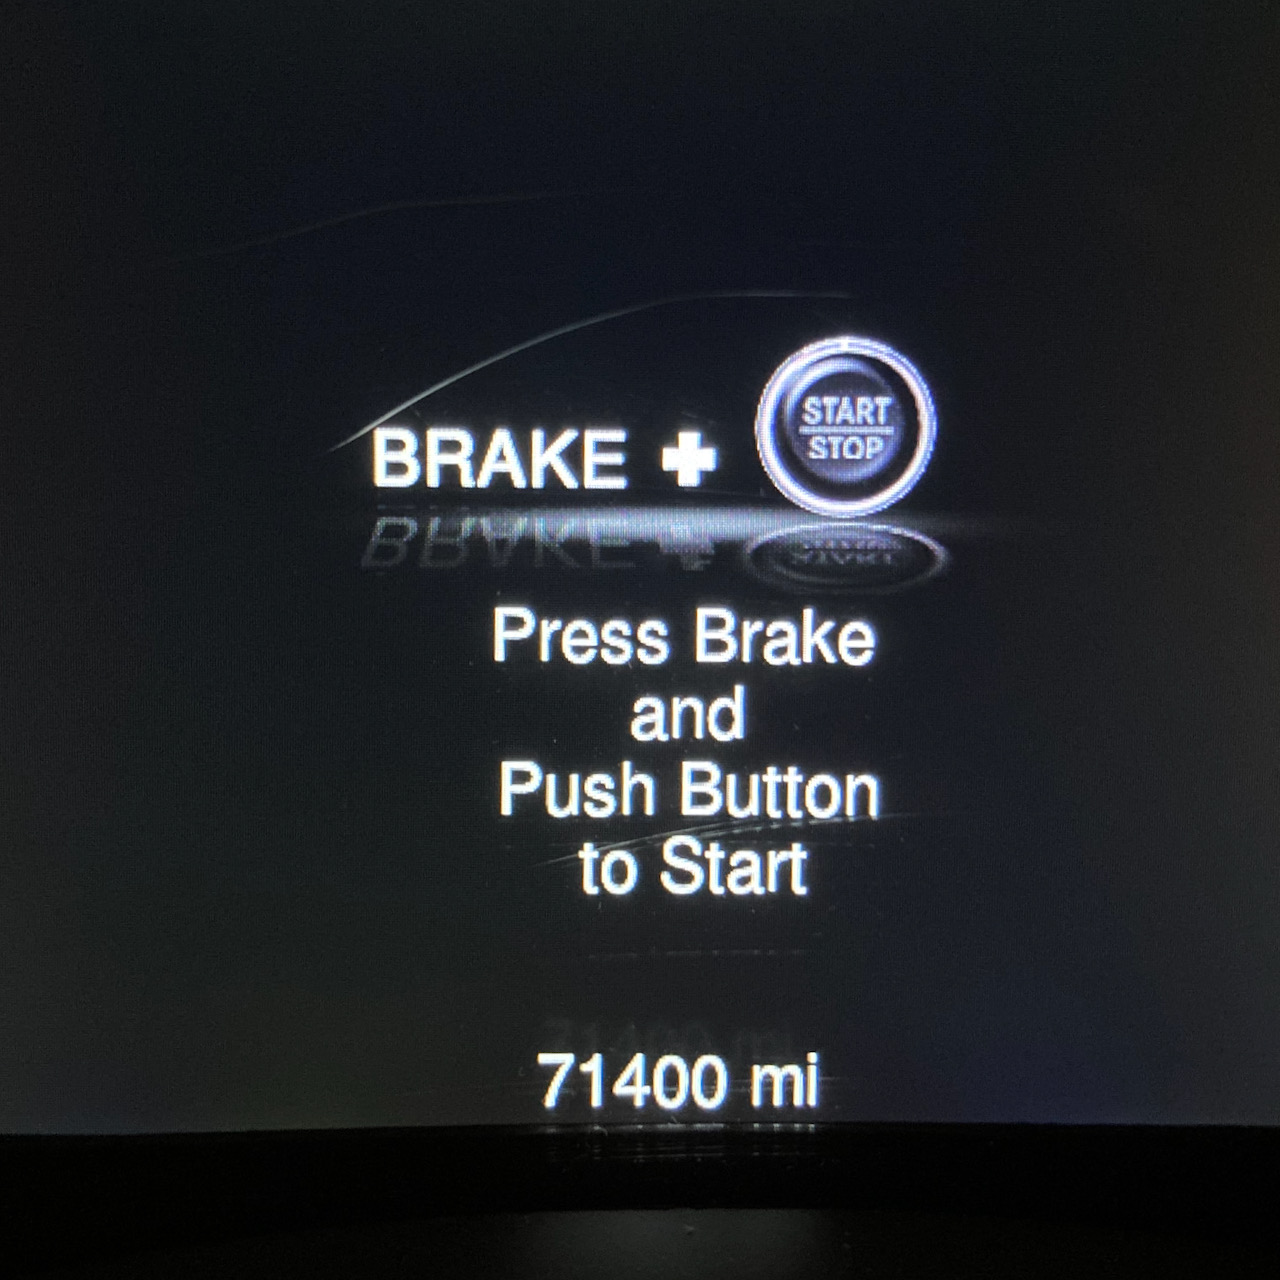 Car odometer reading 71400 miles.